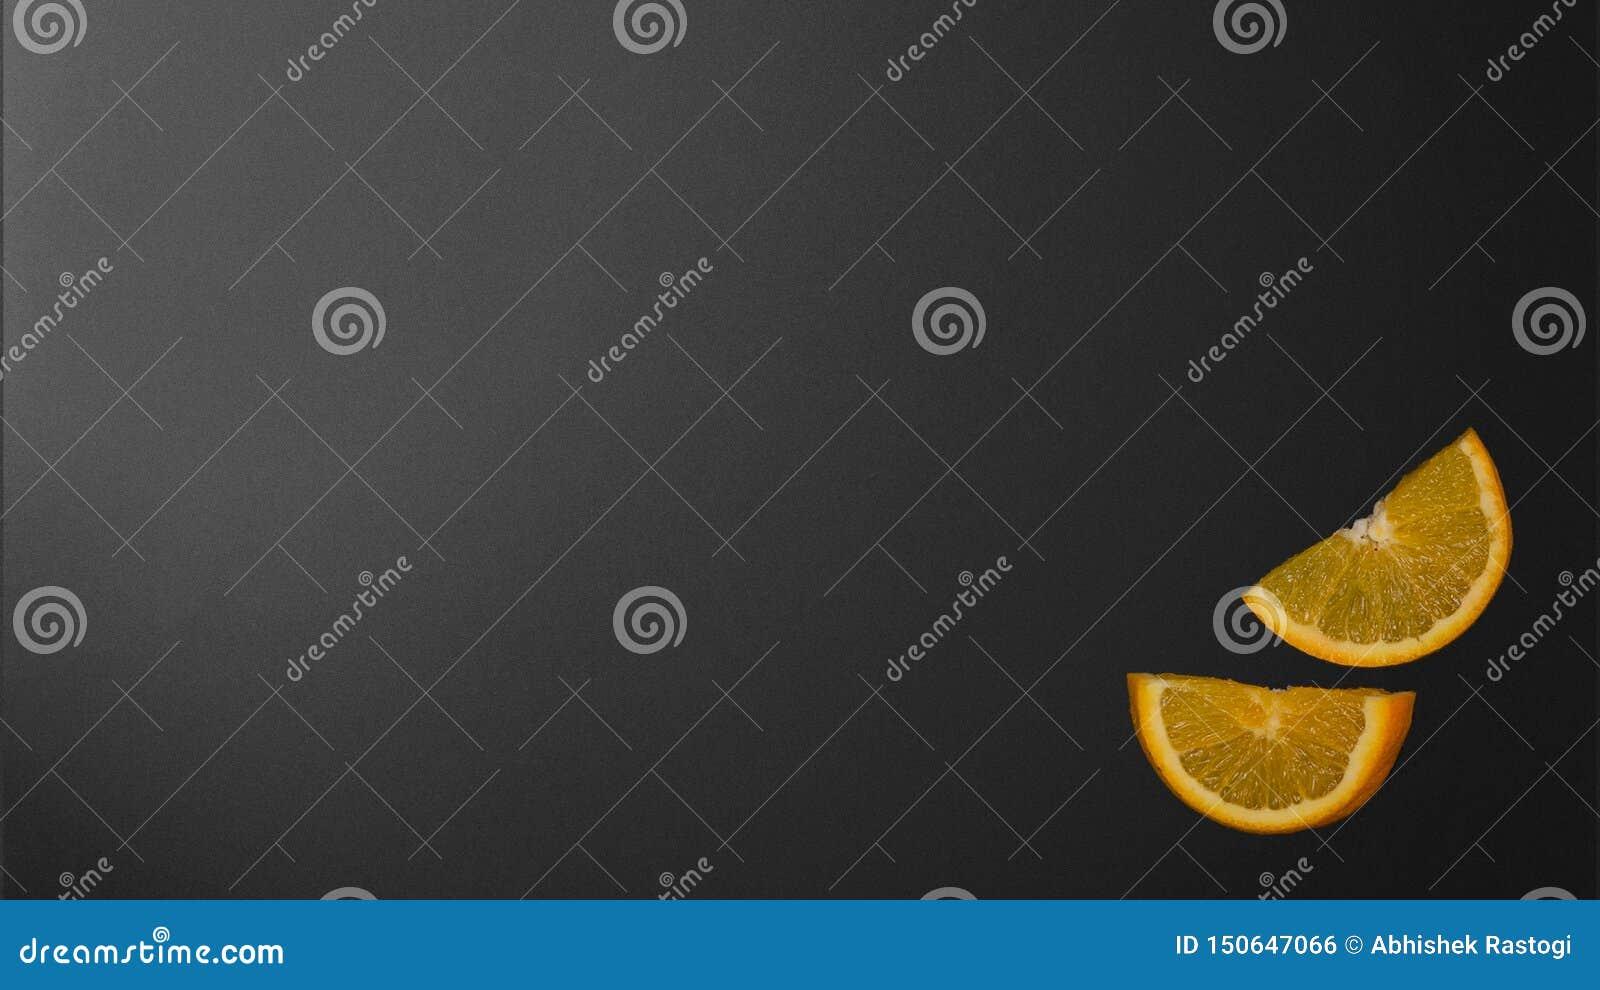 Orange slices on the black background in the kitchen